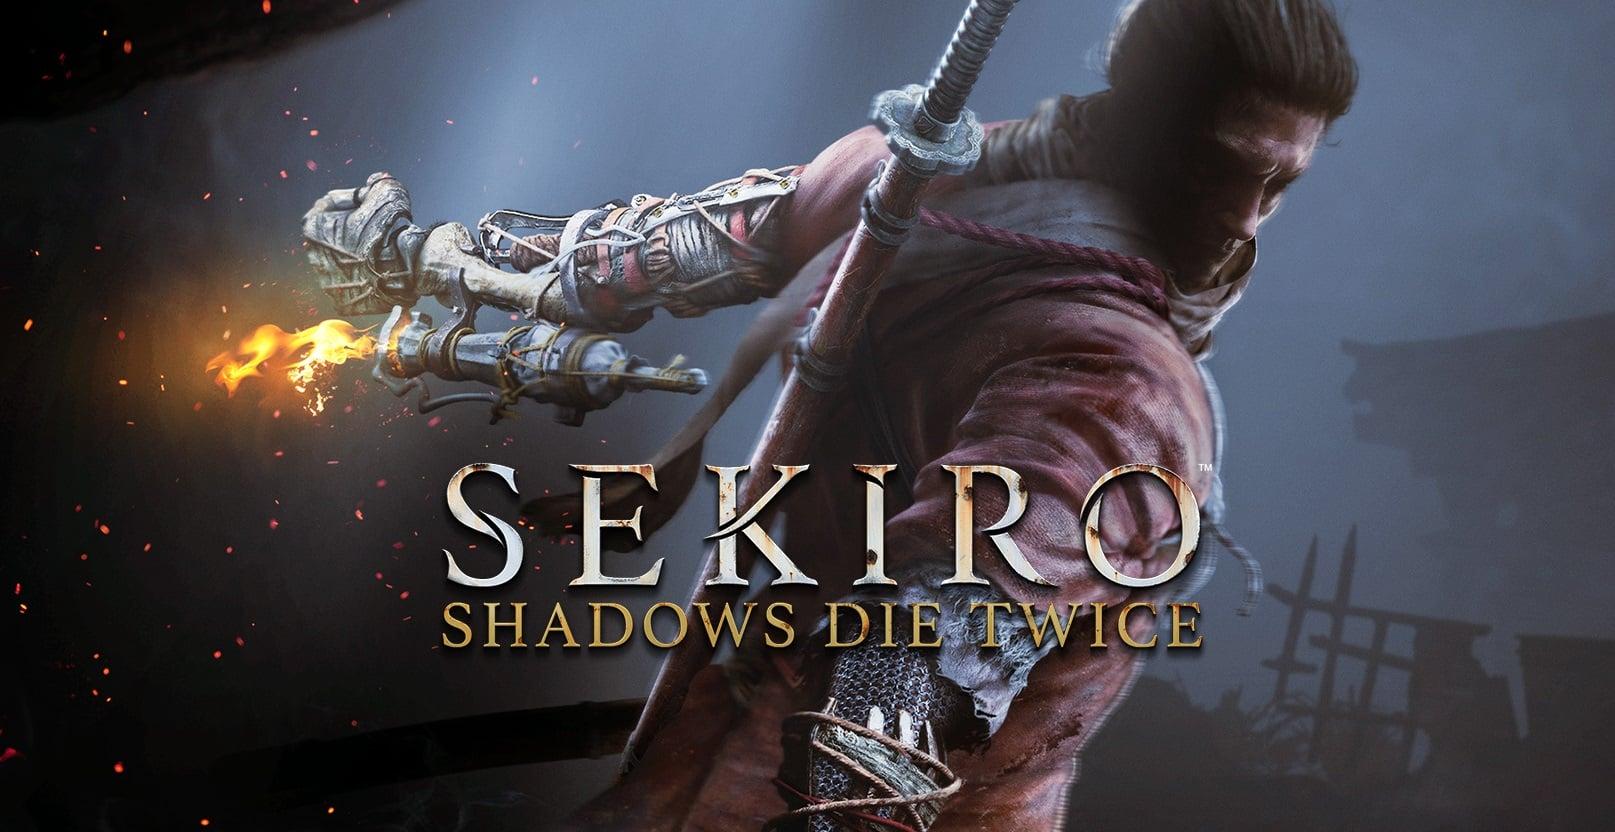 Sekiro: Shadows Die Twice Launch Trailer